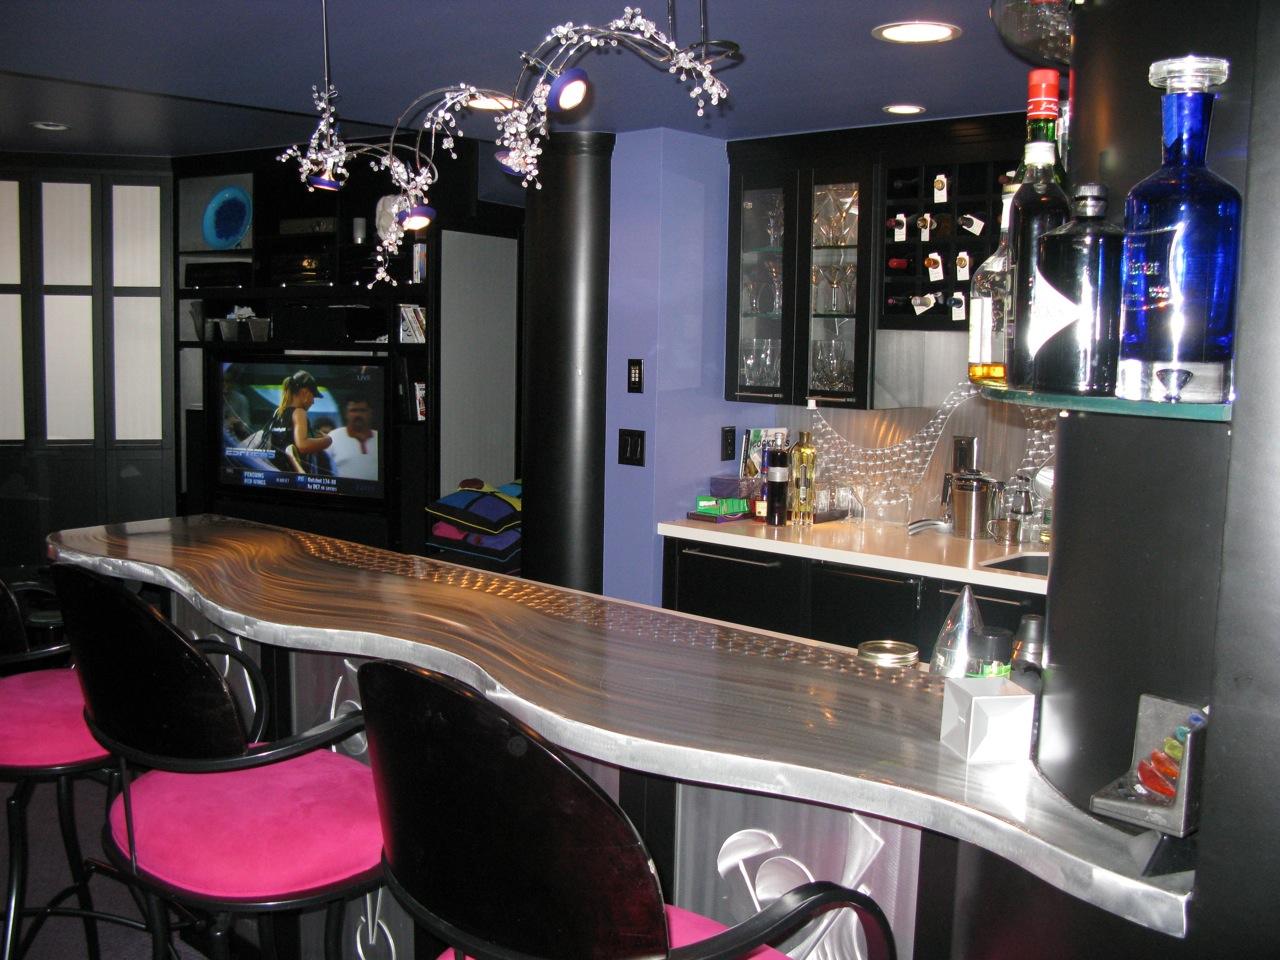 Home Basement Bars New Basement Bar Contest From Grants Whisky The Pegu Blog